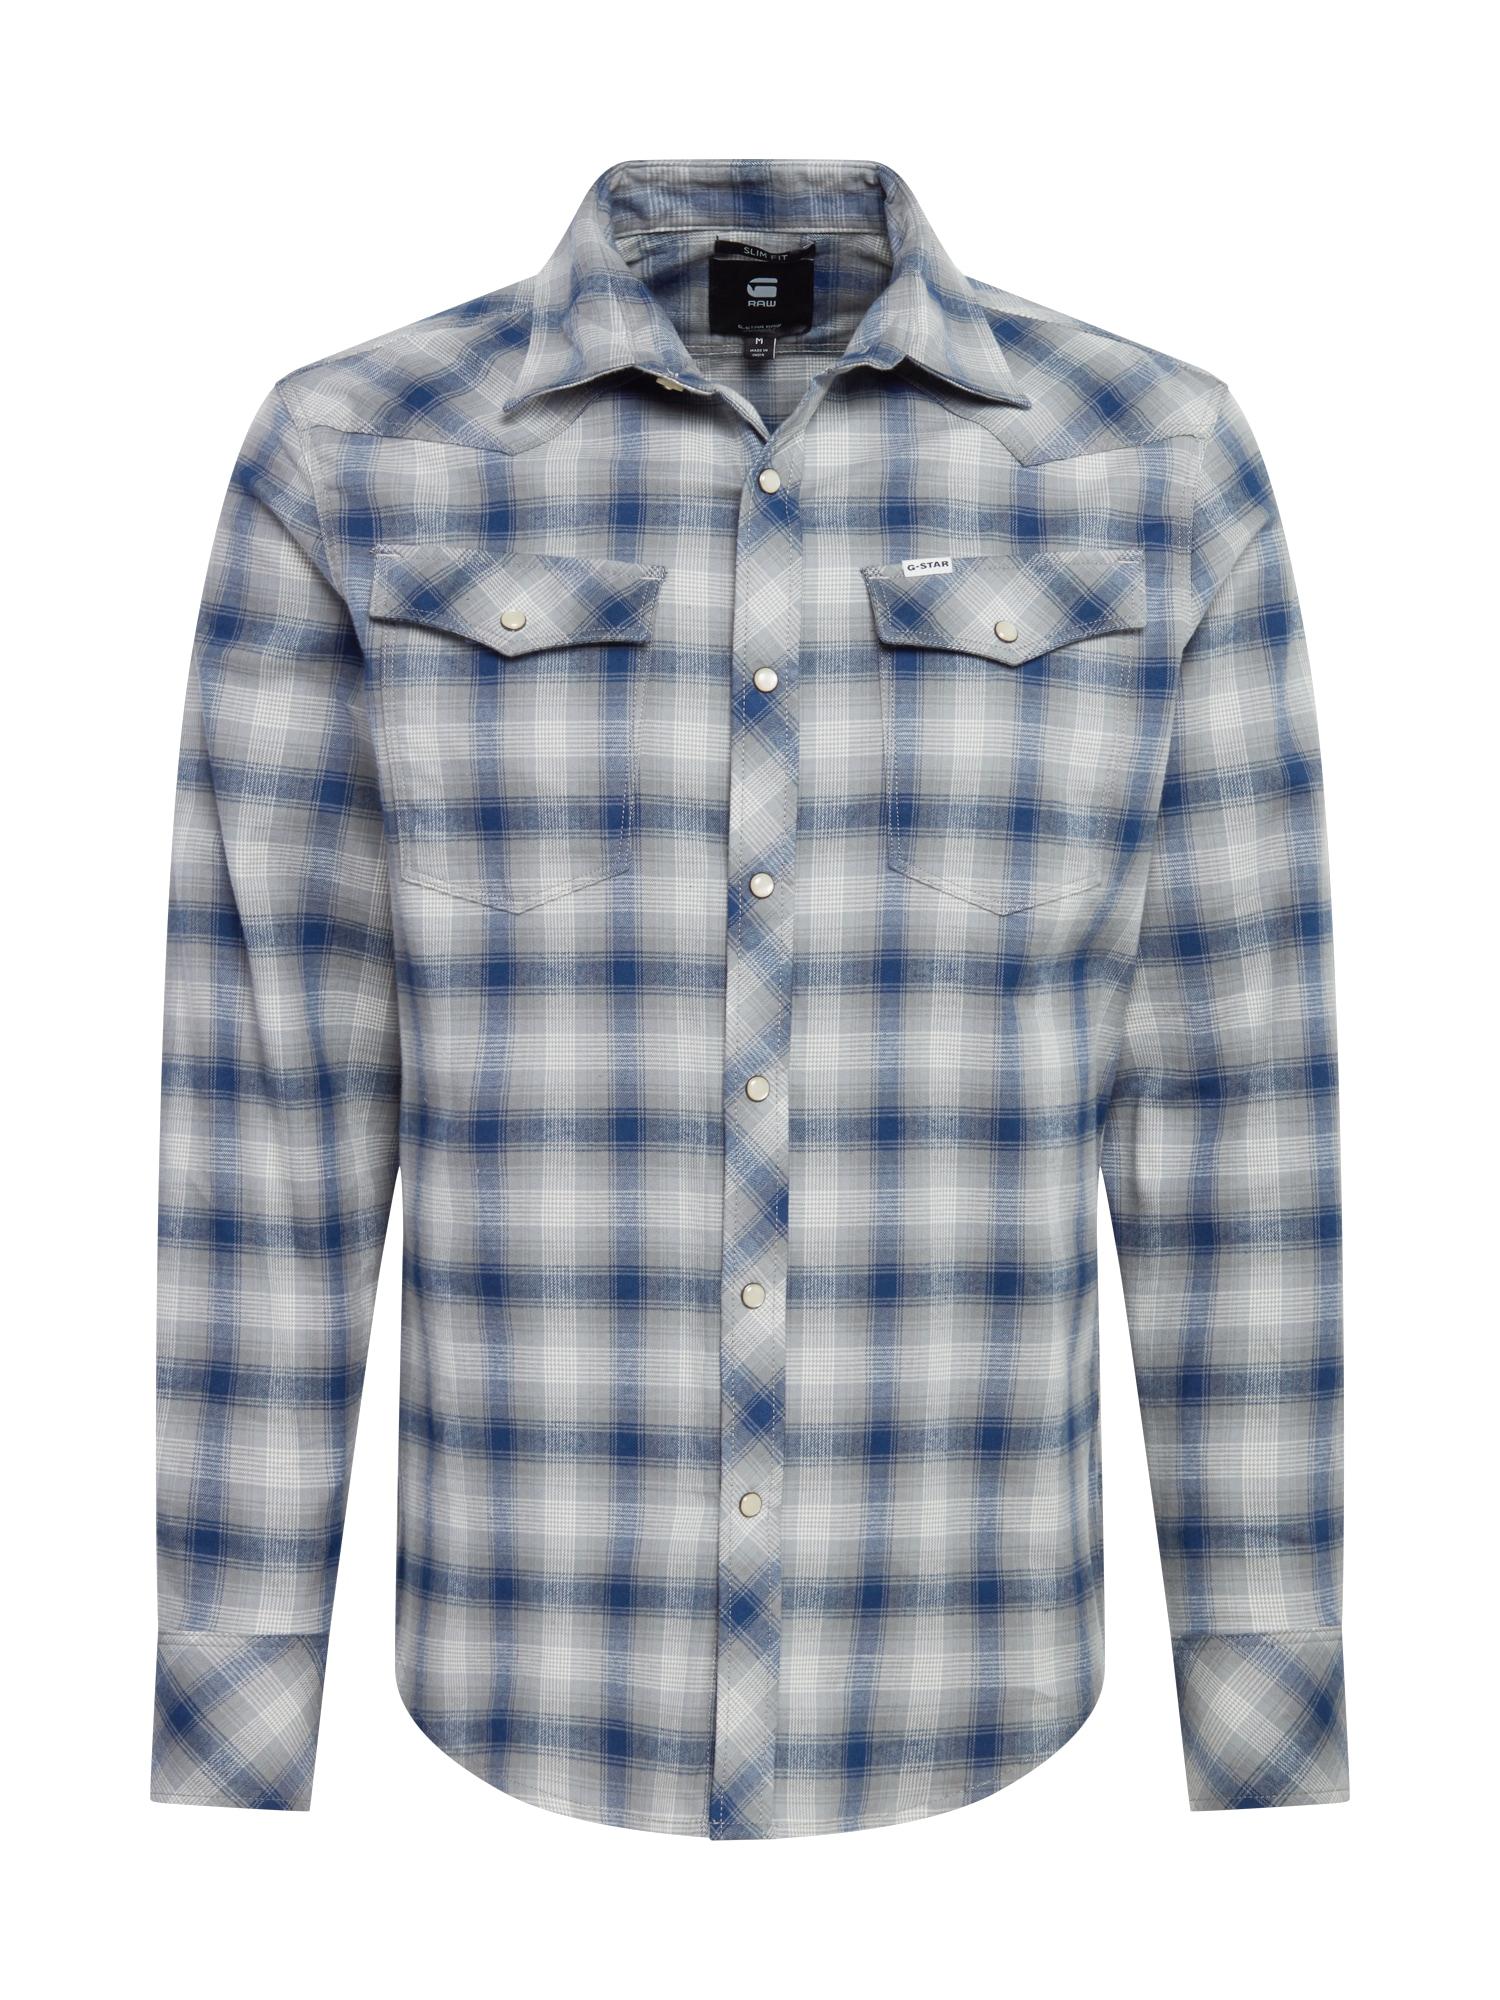 G-Star RAW Marškiniai mėlyna / balta / pilka